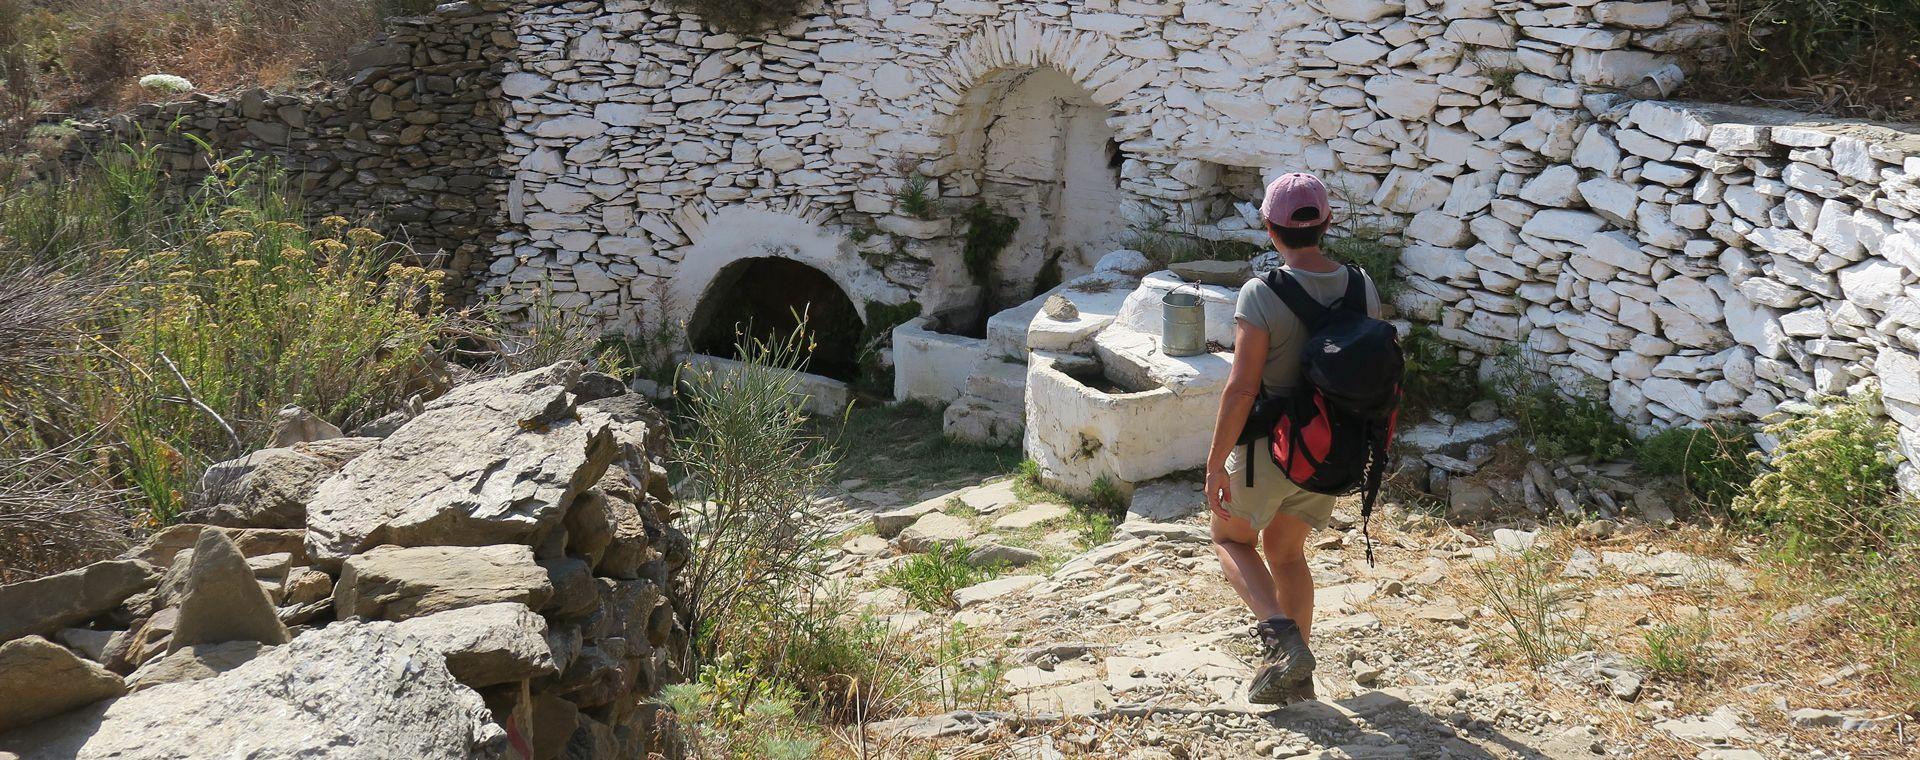 Voyage à pied : Cyclades orientales : Santorin, Naxos et Amorgos